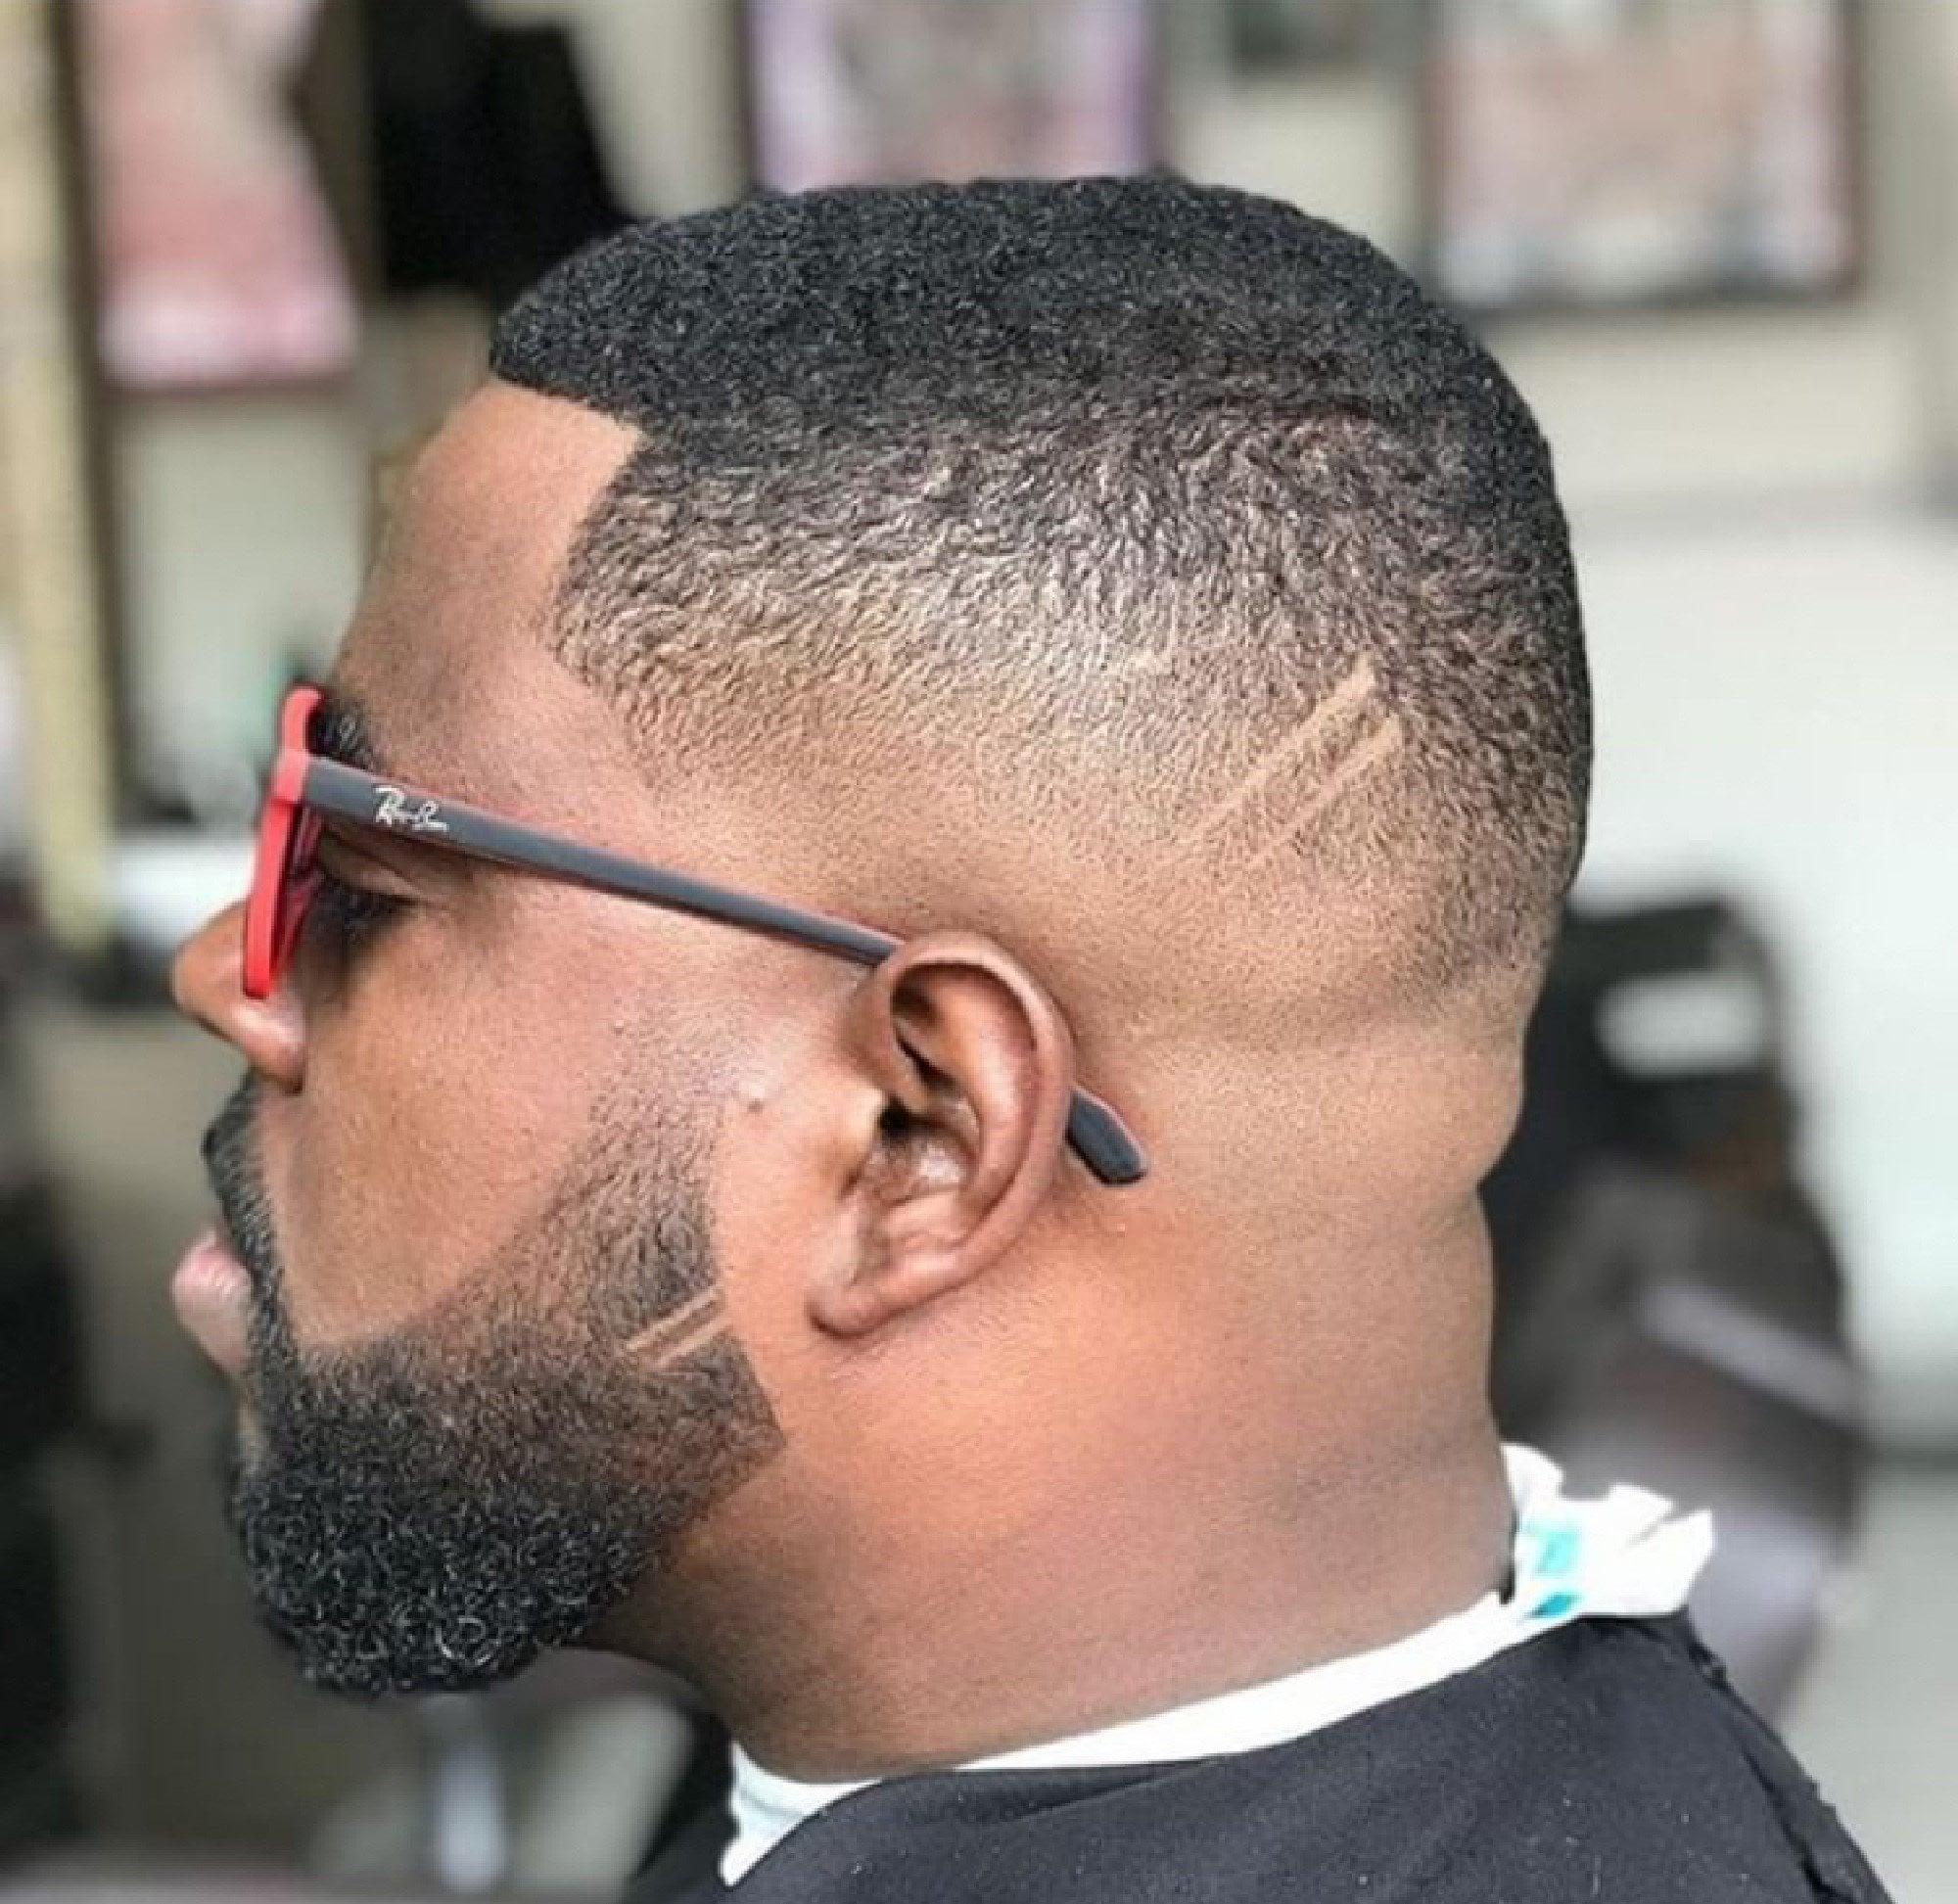 Corte Degradê Masculino No Cabelo Crespo All Things Hair